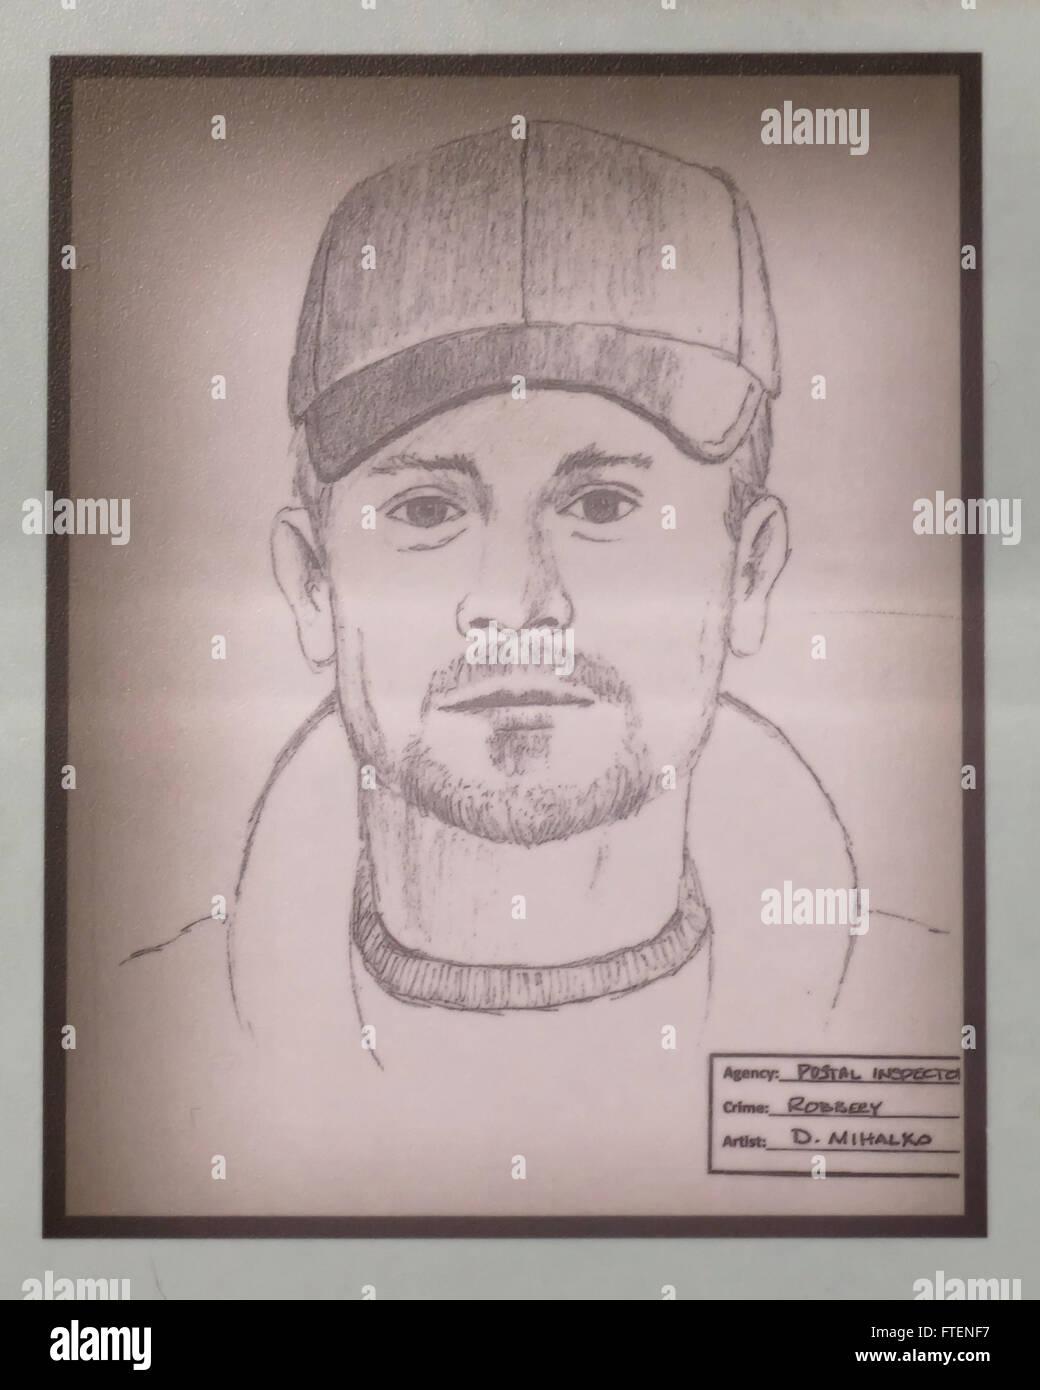 Gesichts composite Skizze des Verdächtigen - USA Stockbild